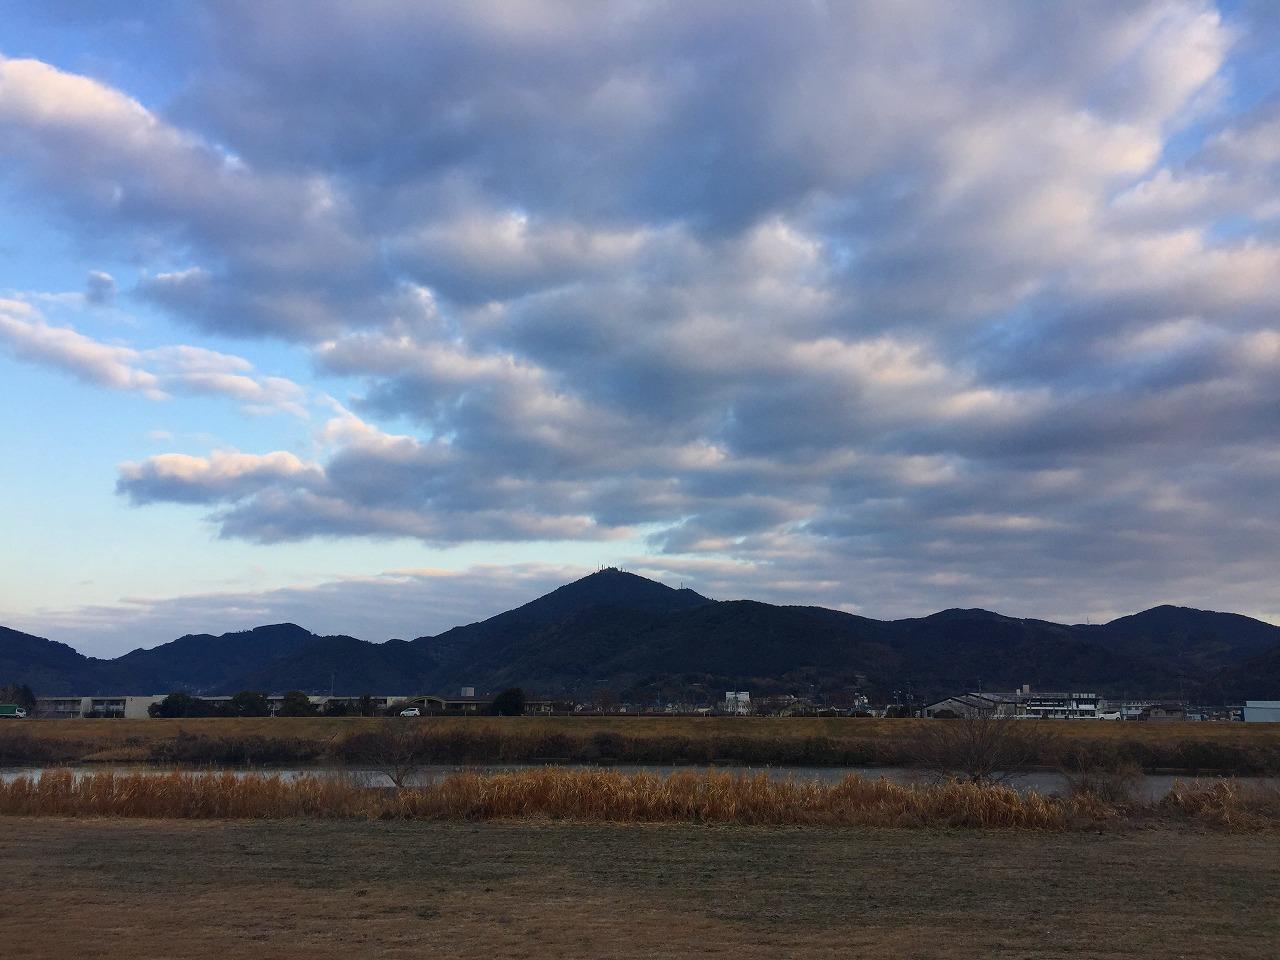 2018 2 14 今朝の金峰山